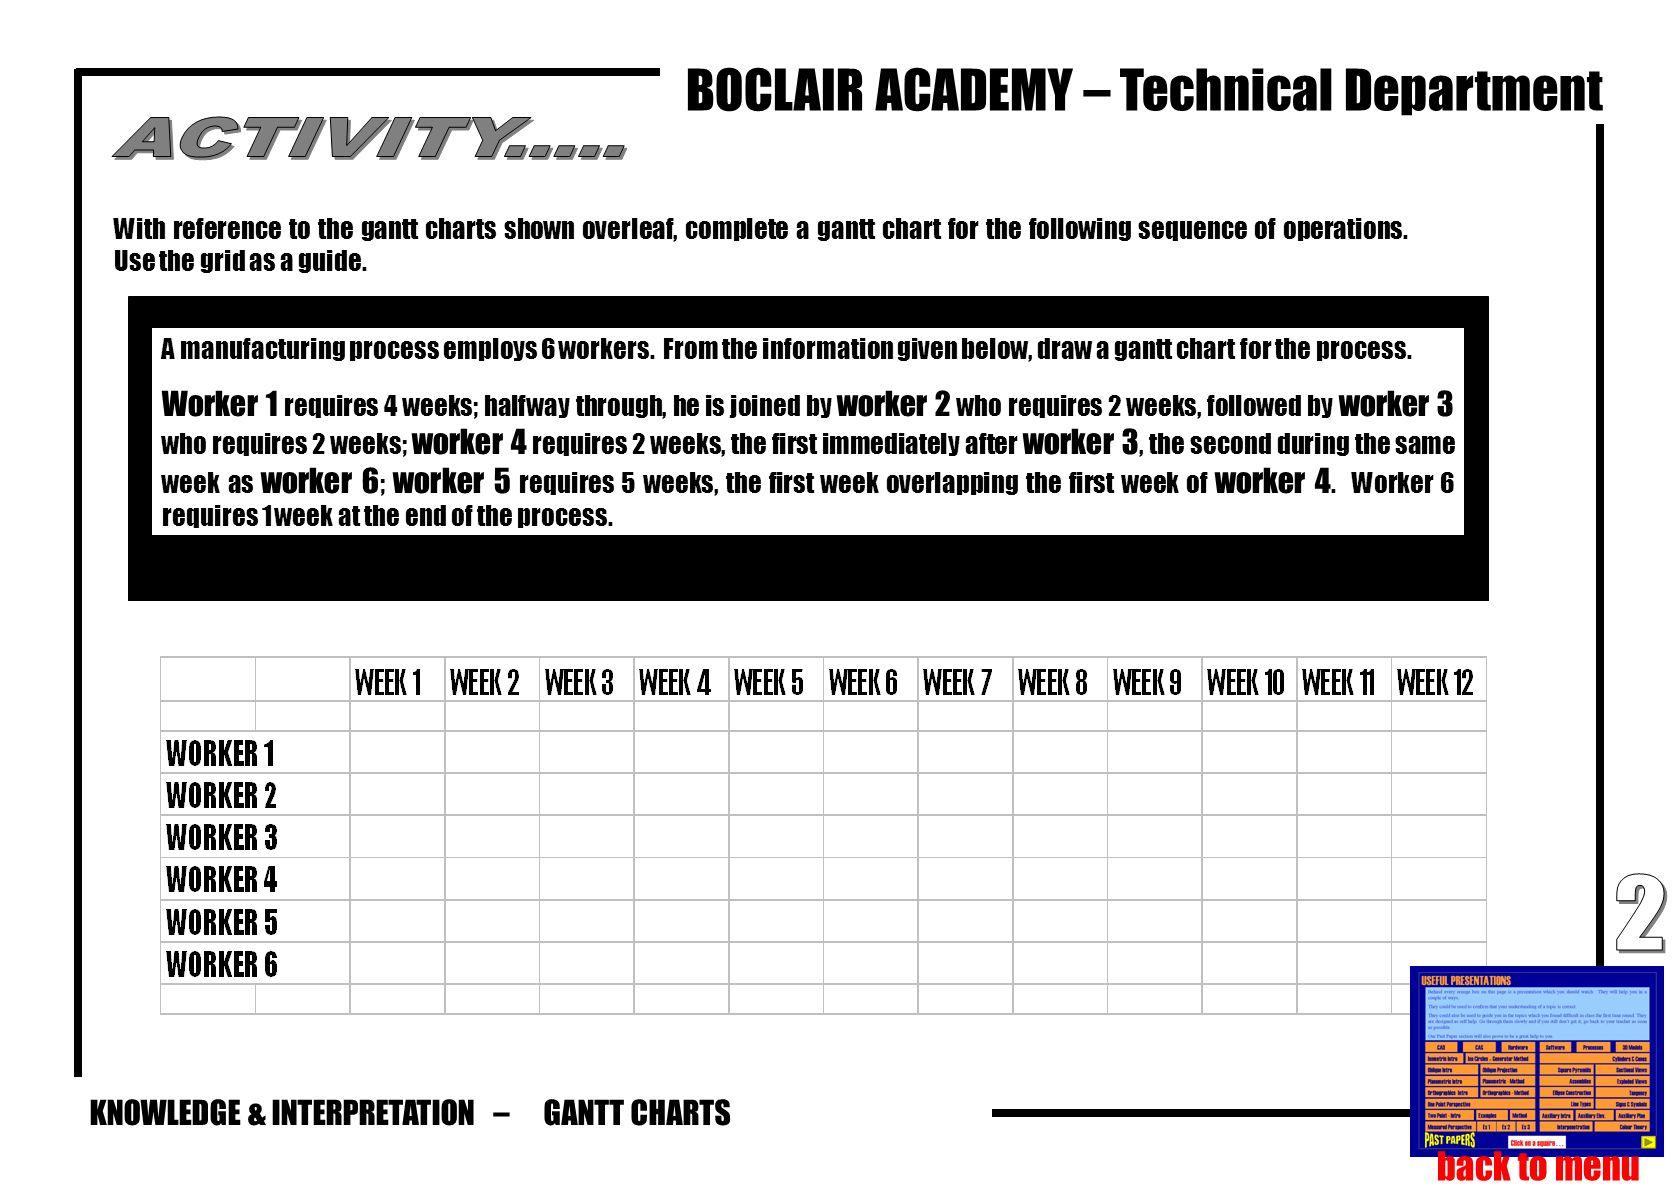 Knowledge Interpretation Boclair Academy Technical Department